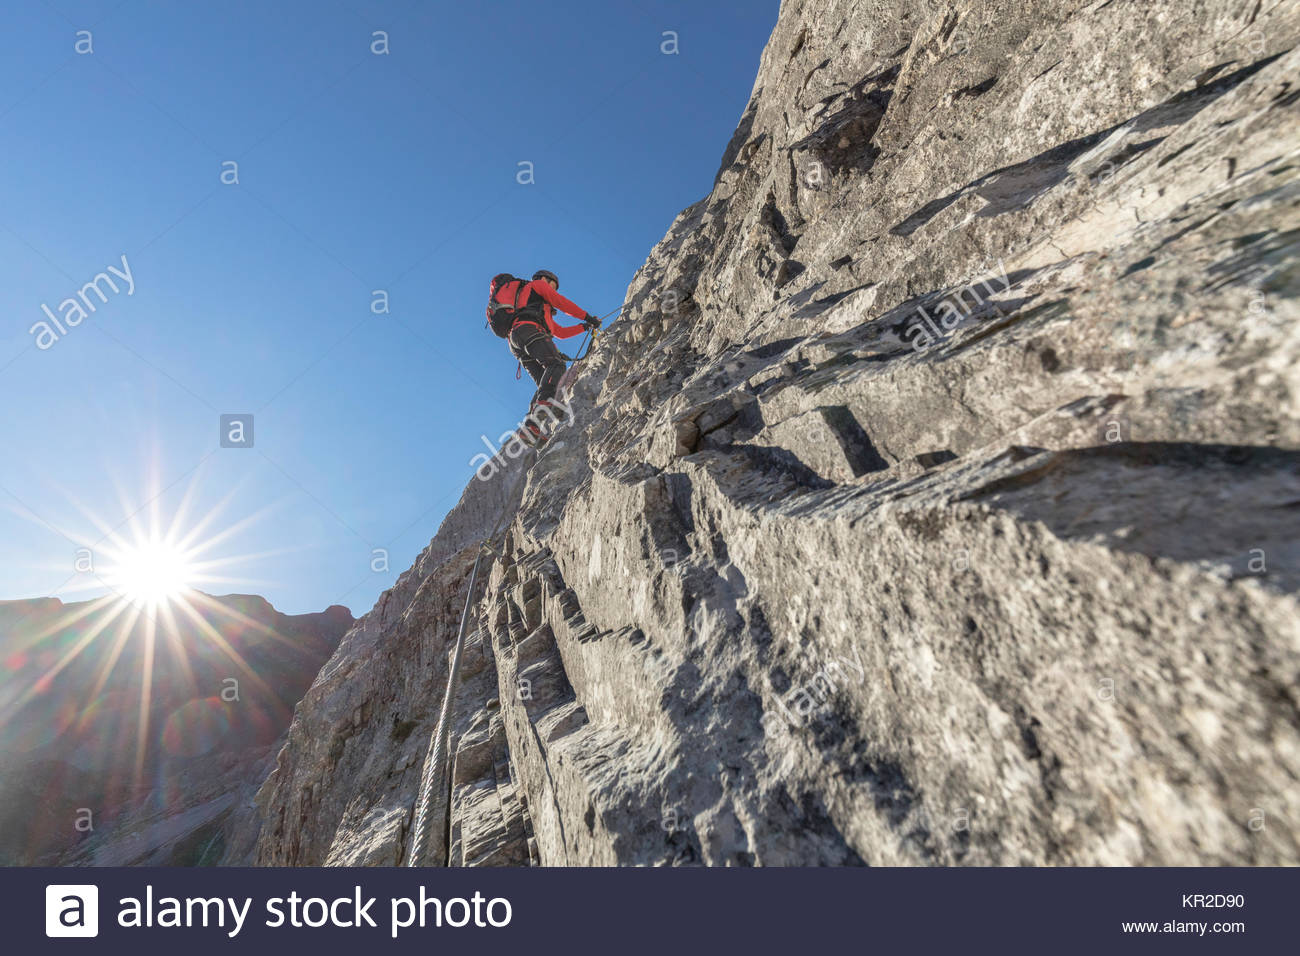 Klettersteig Lienz : Bergsteiger entlang der klettersteig an nordseite des gr